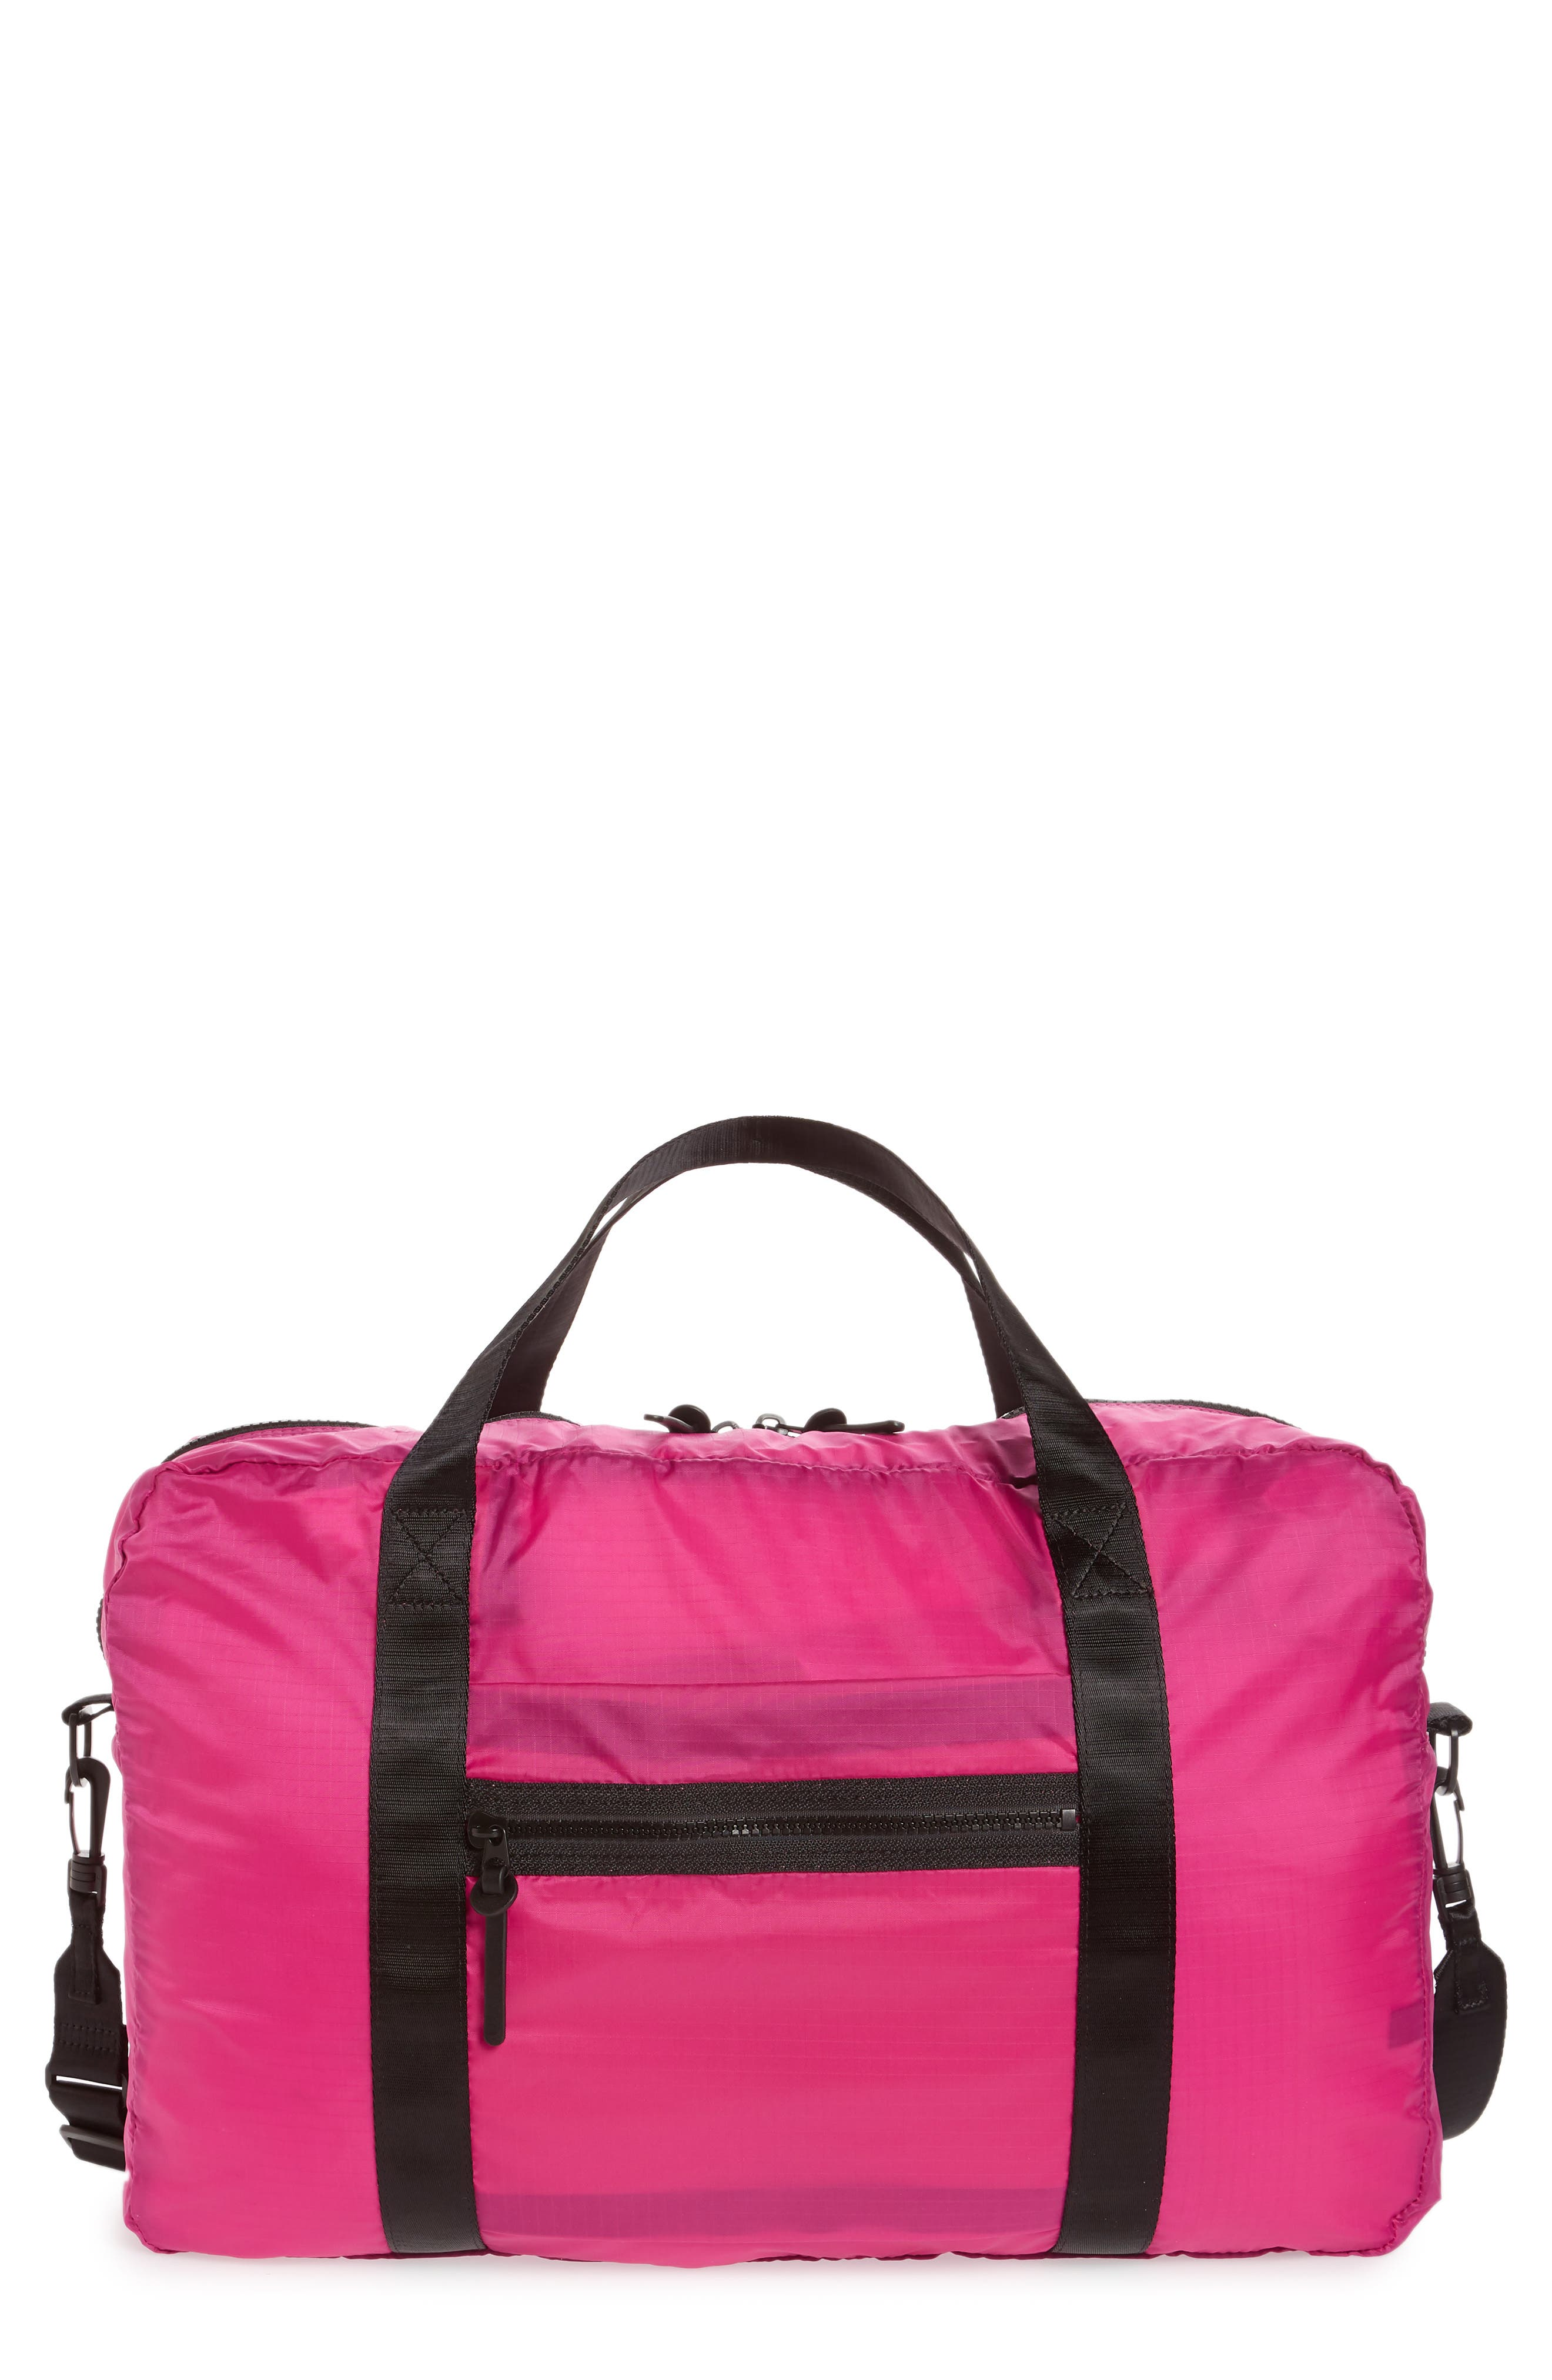 Packable Nylon Duffel Bag,                             Main thumbnail 3, color,